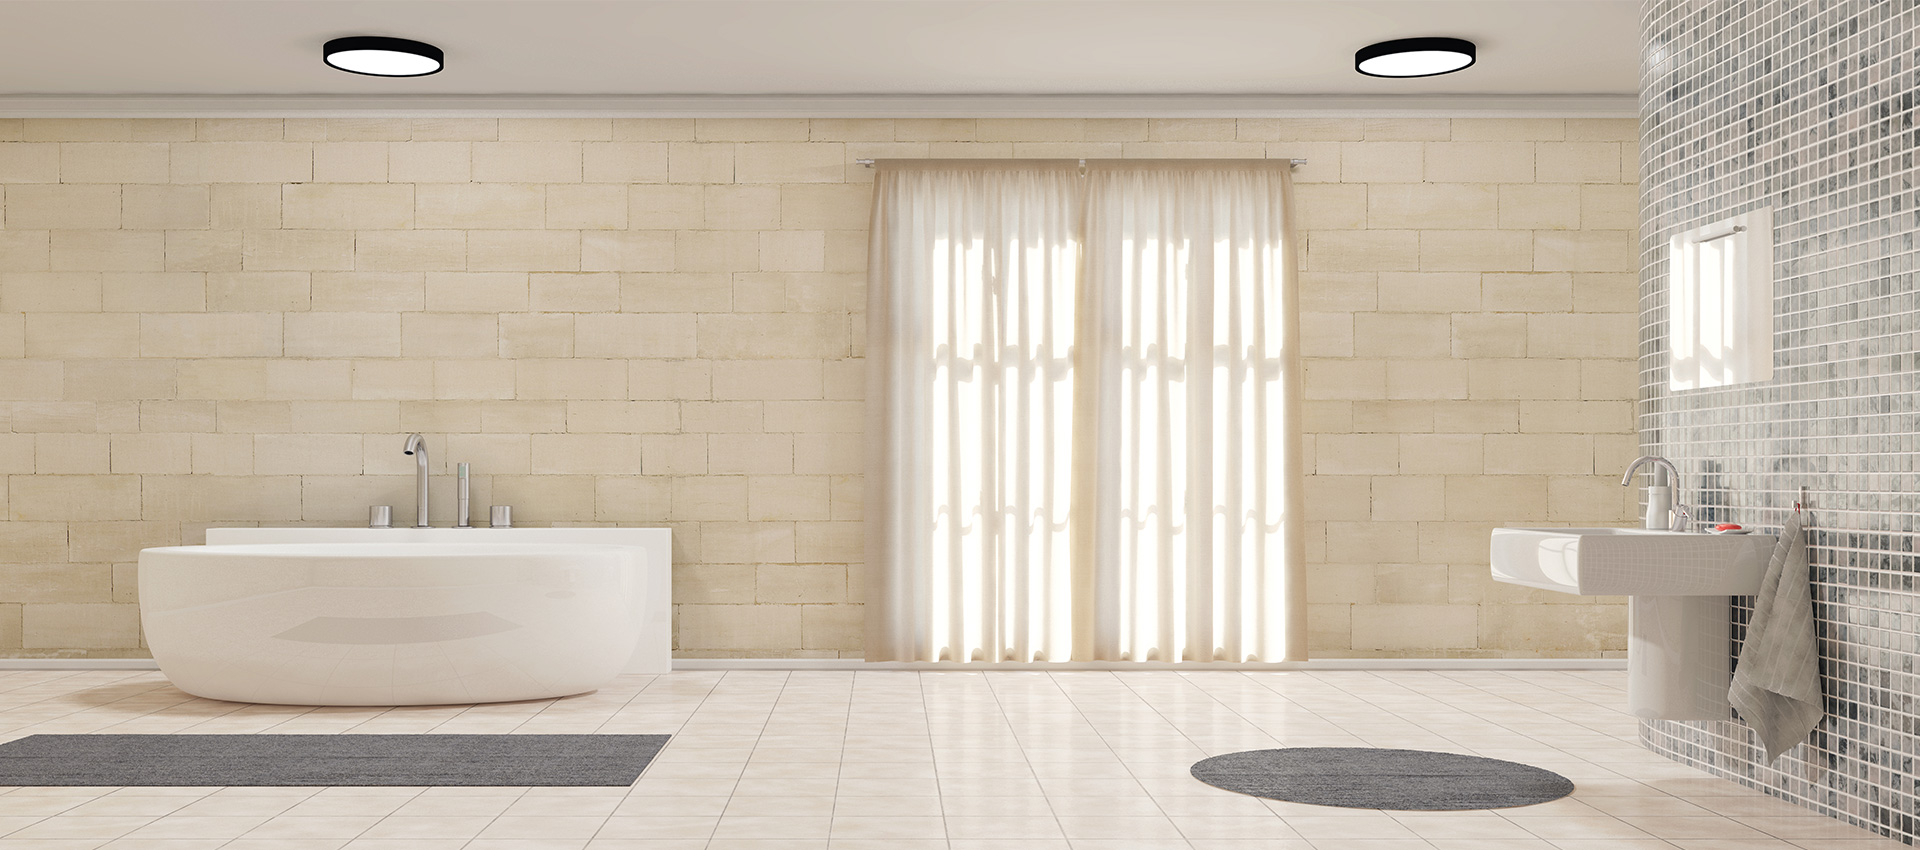 19D SHOWROOM – Rénovation salle de bains Gradignan, Talence.